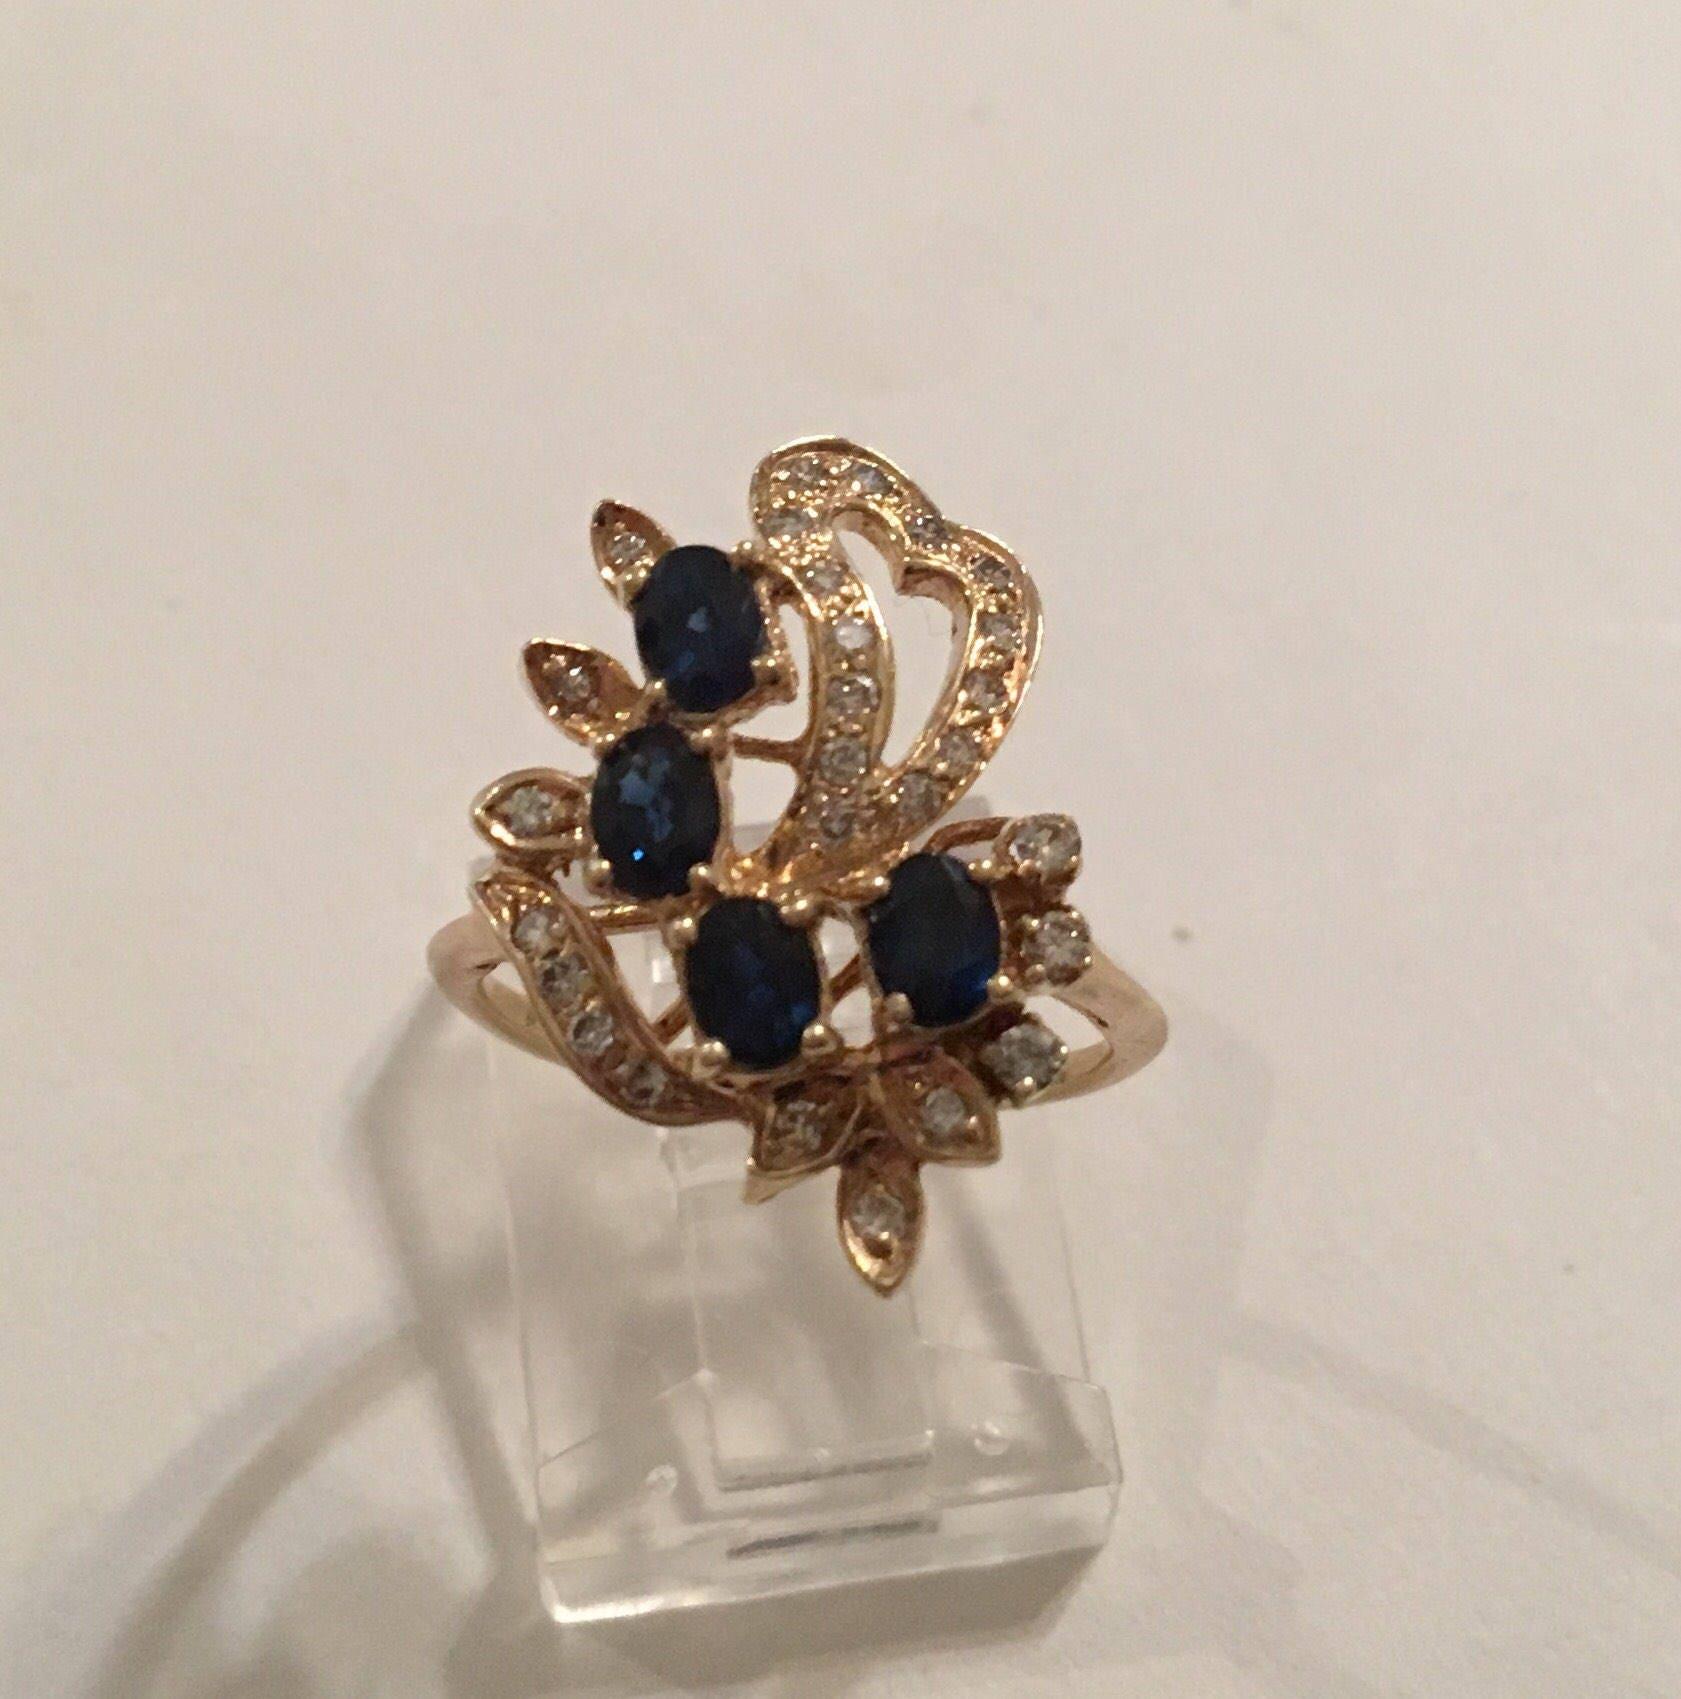 Vintage 14K Yellow Gold Blue Sapphire & Diamond Cocktail Ring